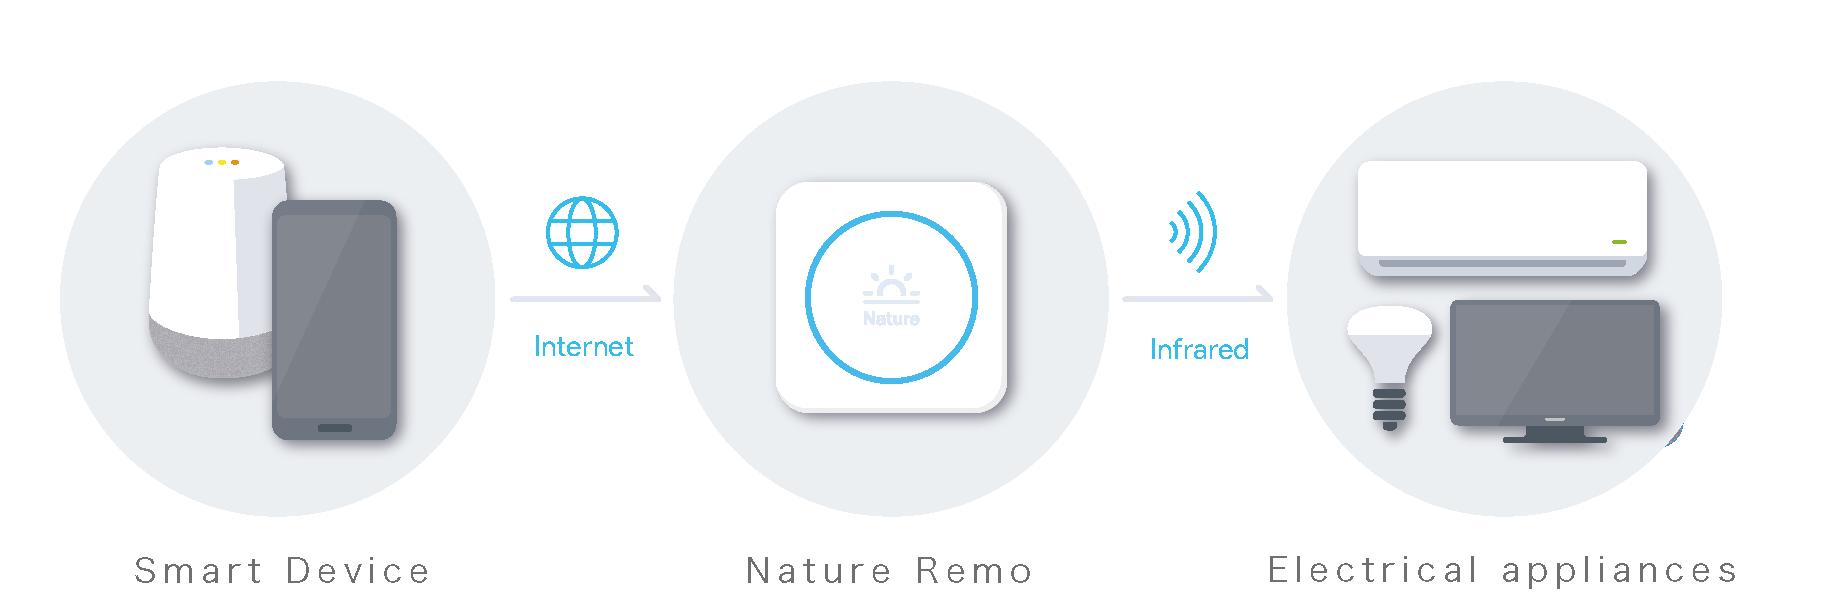 Nature Remoとは_en.png